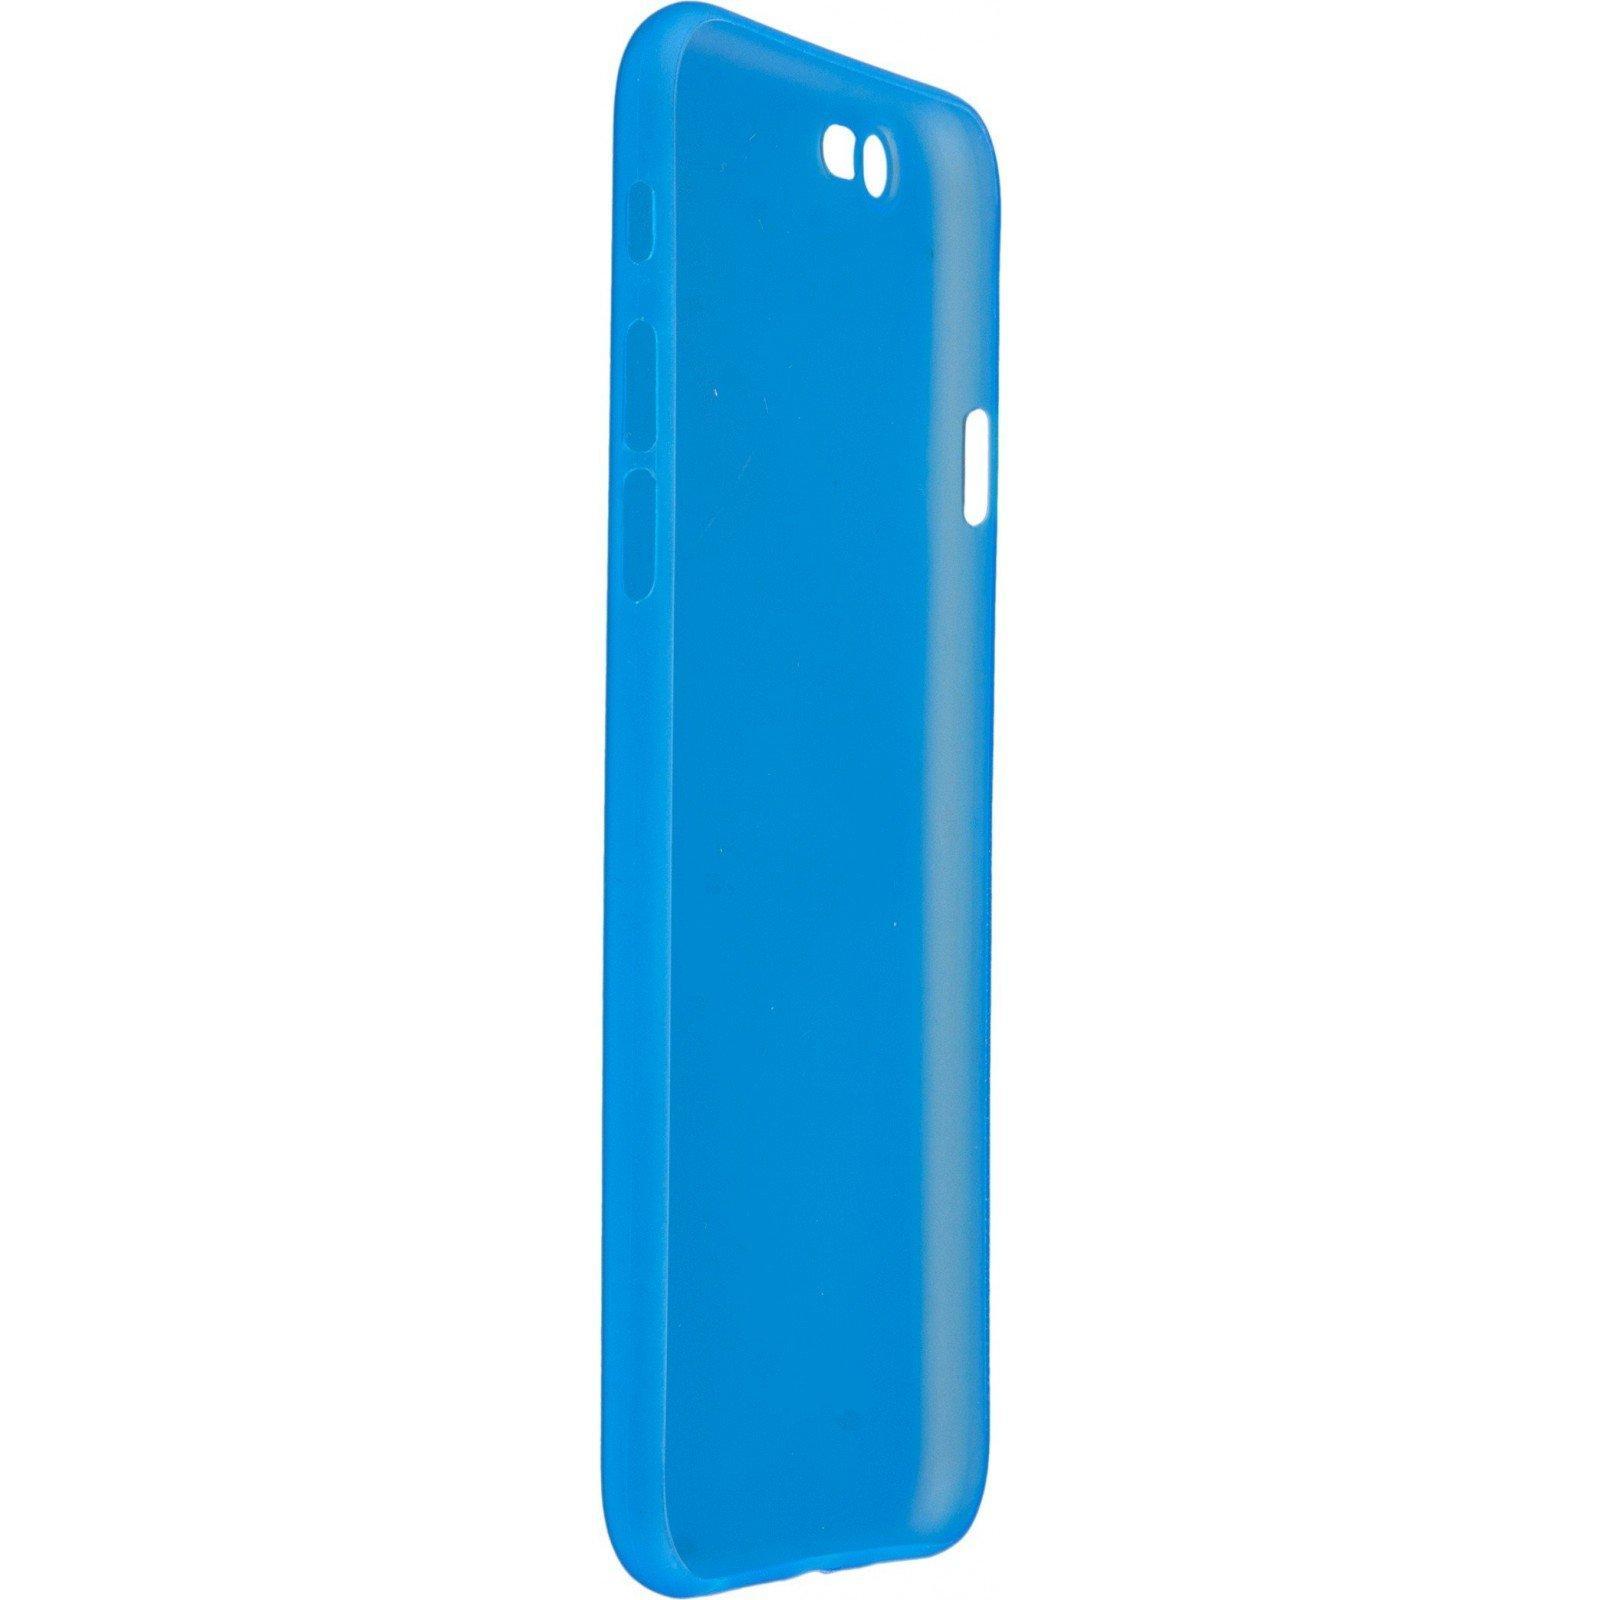 Чехол для моб. телефона MakeFuture Ice Case (PP) для Apple iPhone 6 Blue (MCI-AI6BL) изображение 4